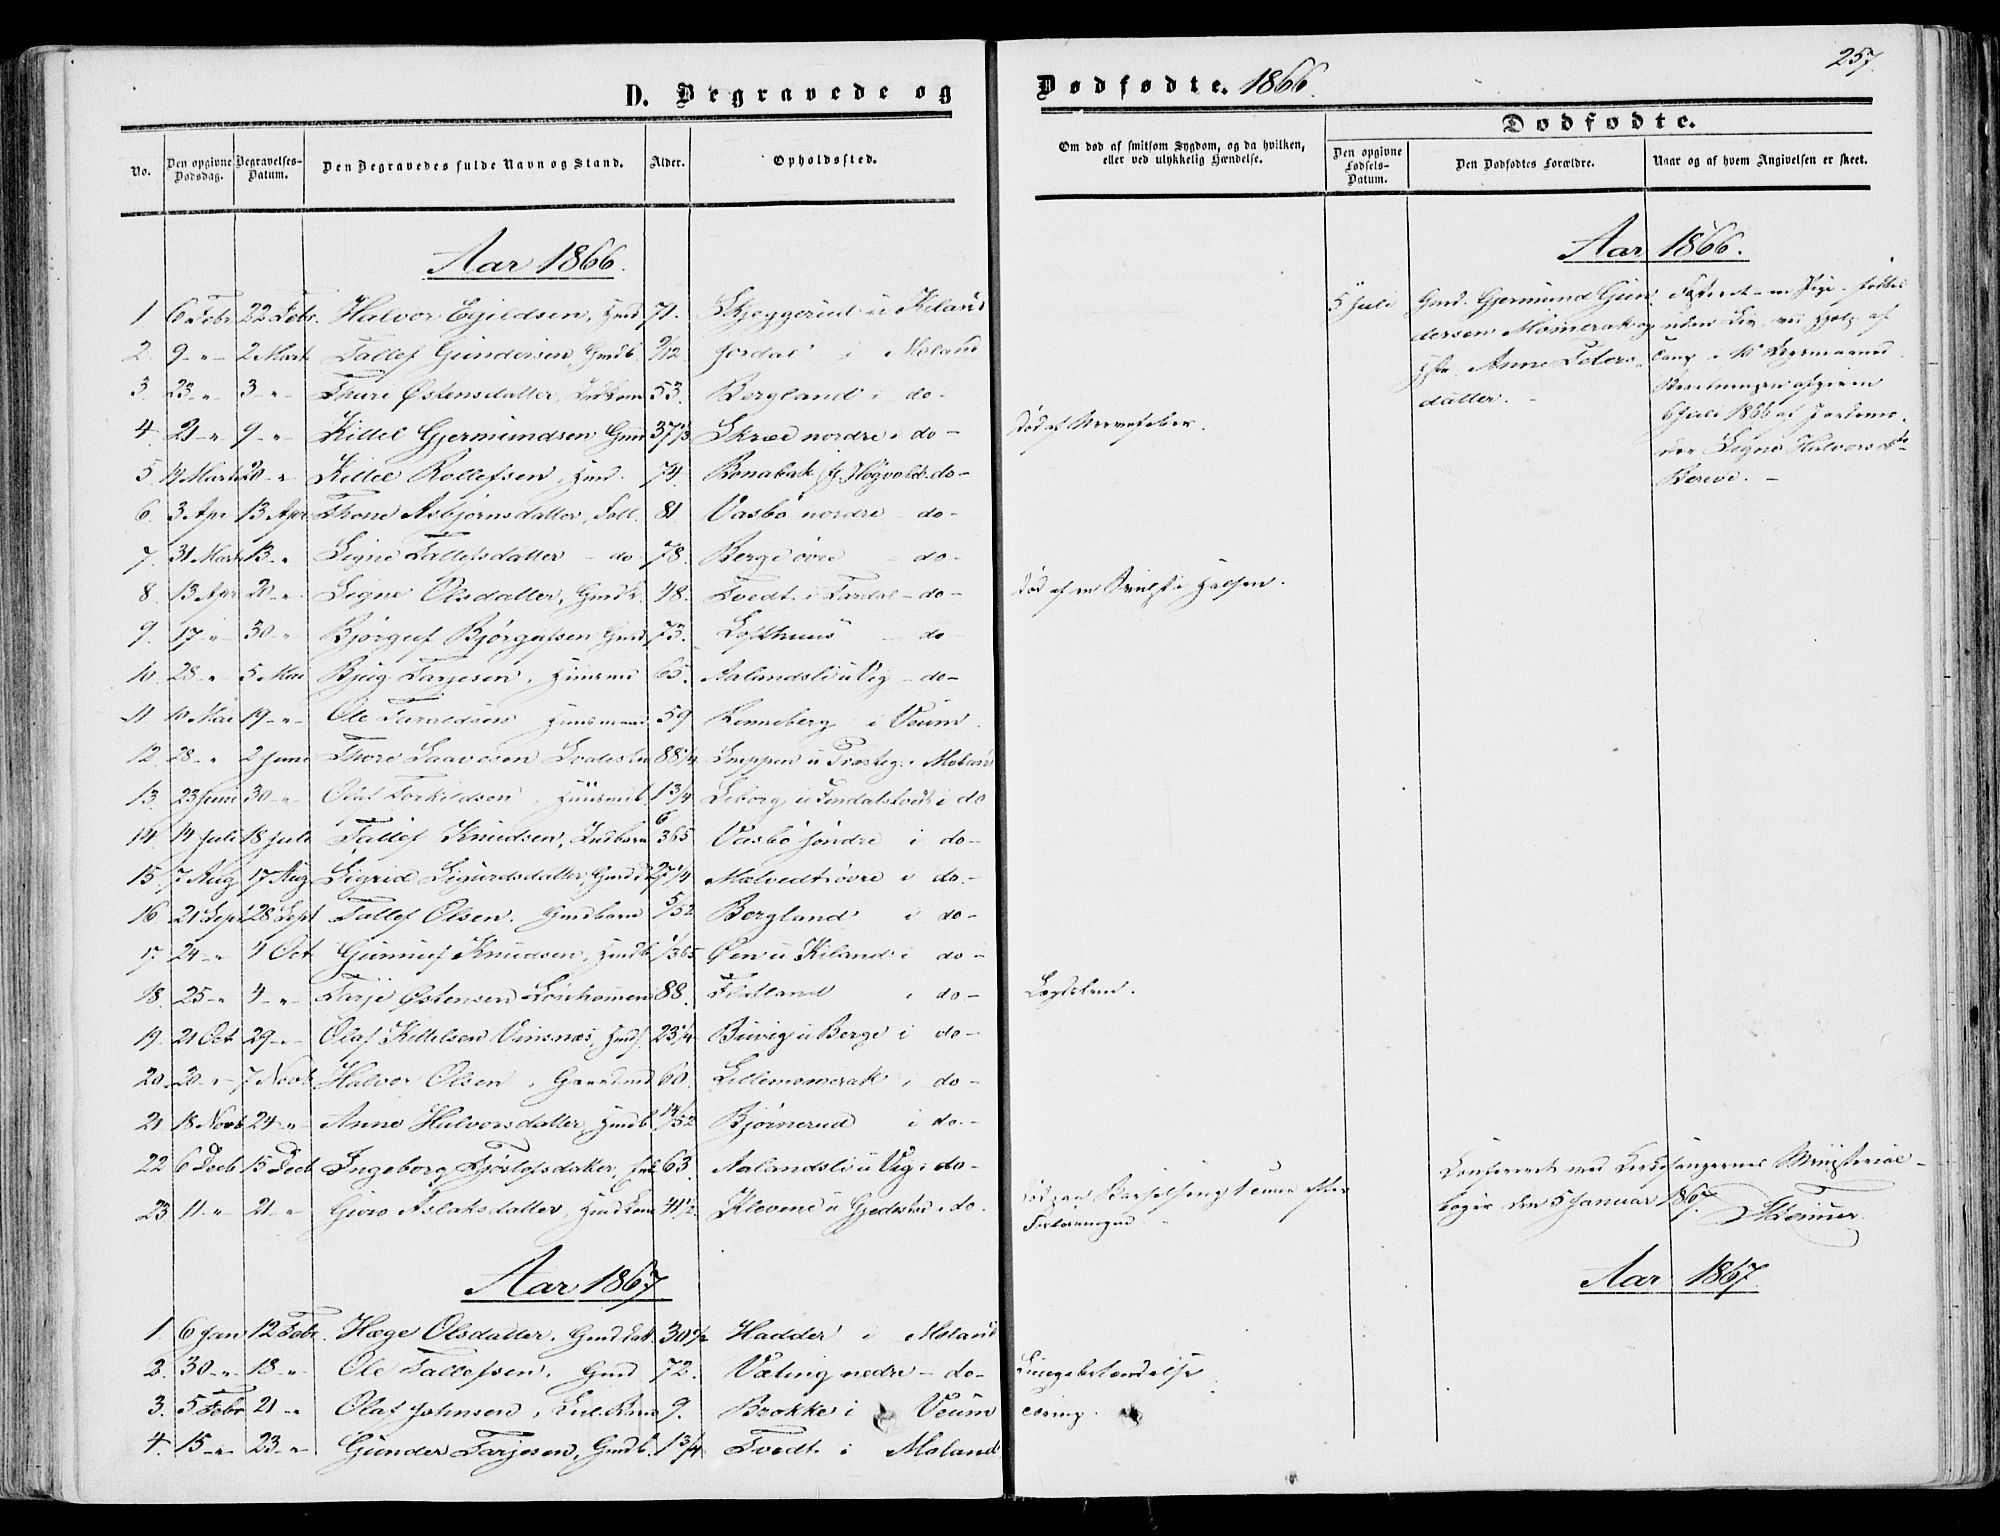 SAKO, Fyresdal kirkebøker, F/Fa/L0005: Parish register (official) no. I 5, 1855-1871, p. 257